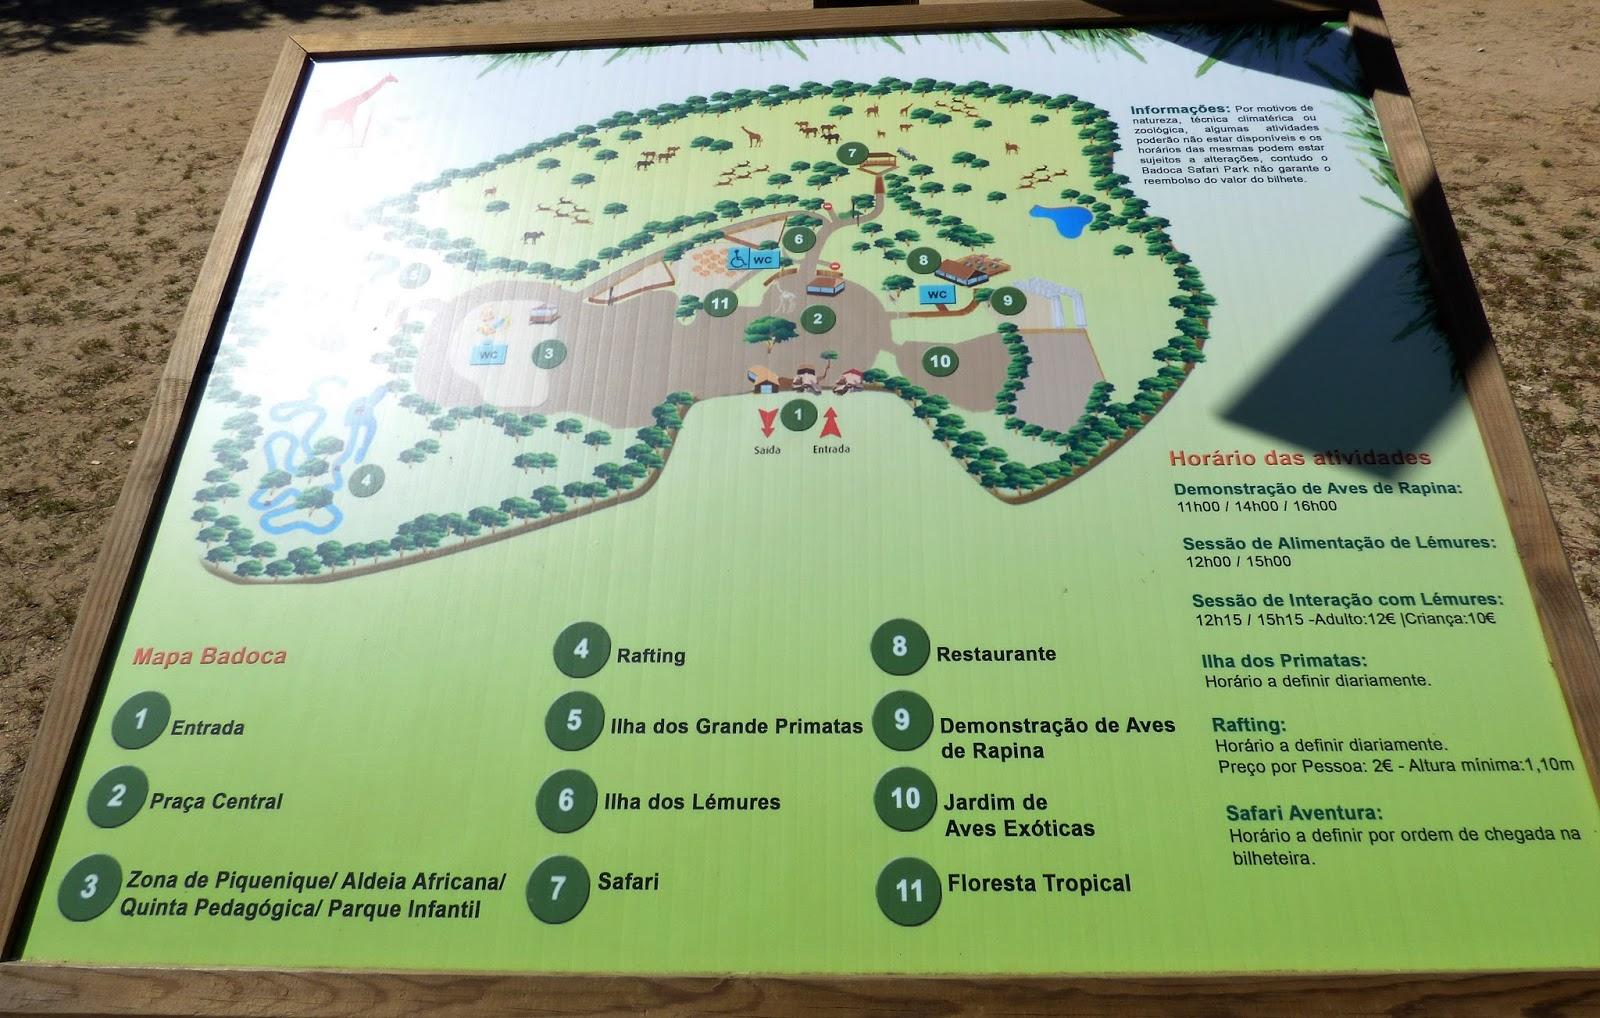 badoca safari park mapa Viajar e descobrir: Portugal   Vila Nova de Santo André   Badoca  badoca safari park mapa